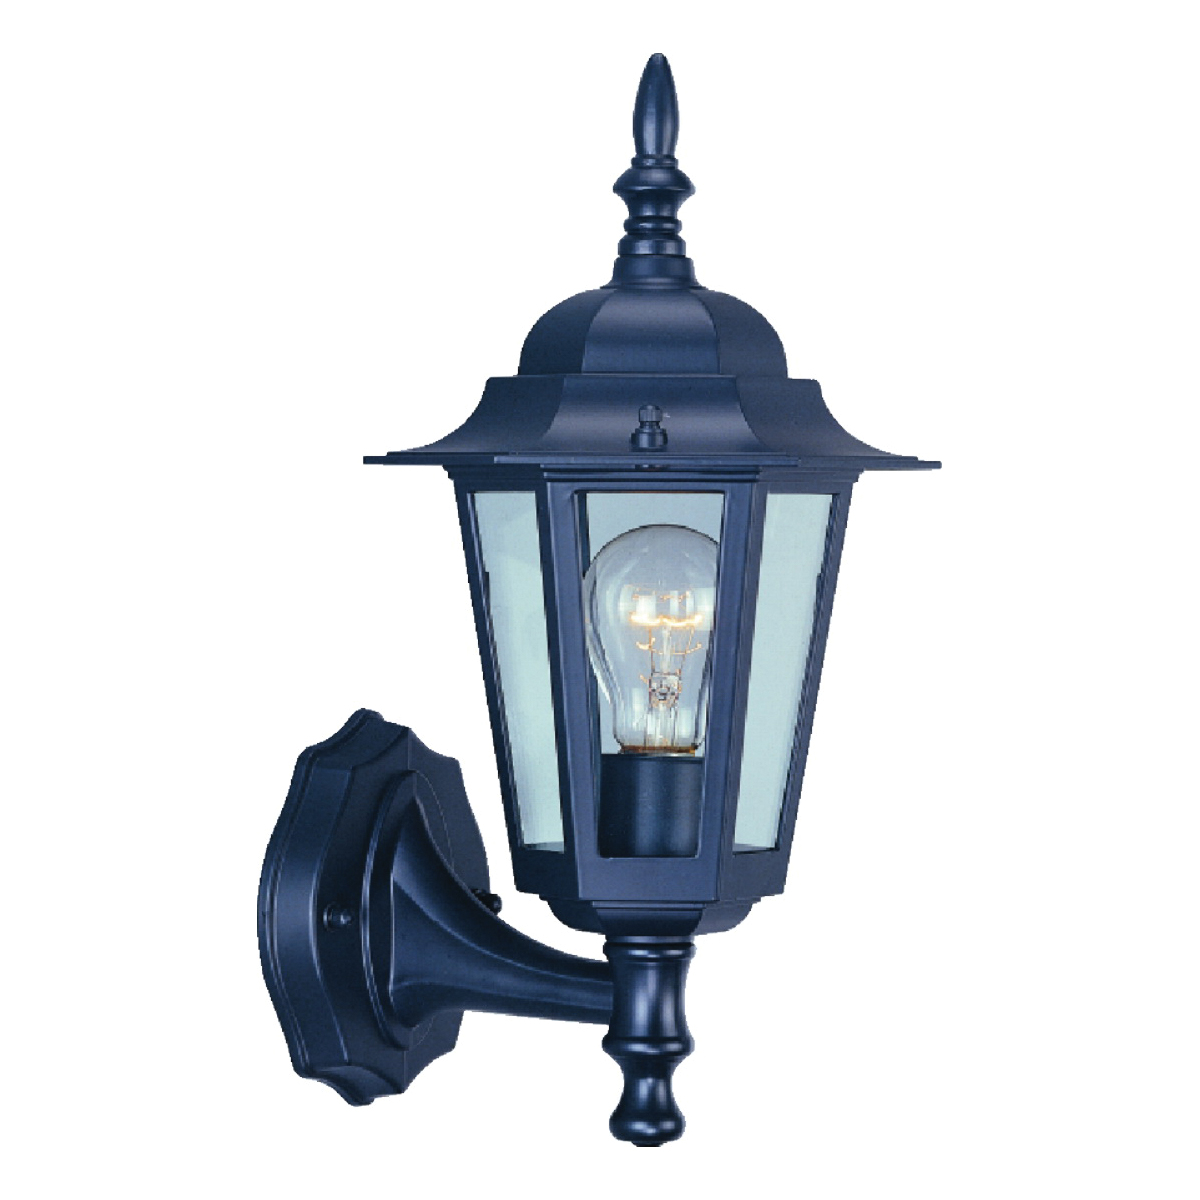 Picture of Boston Harbor AL8041-5 Porch Light Fixture, CFL Lamp, Aluminum Fixture, Black